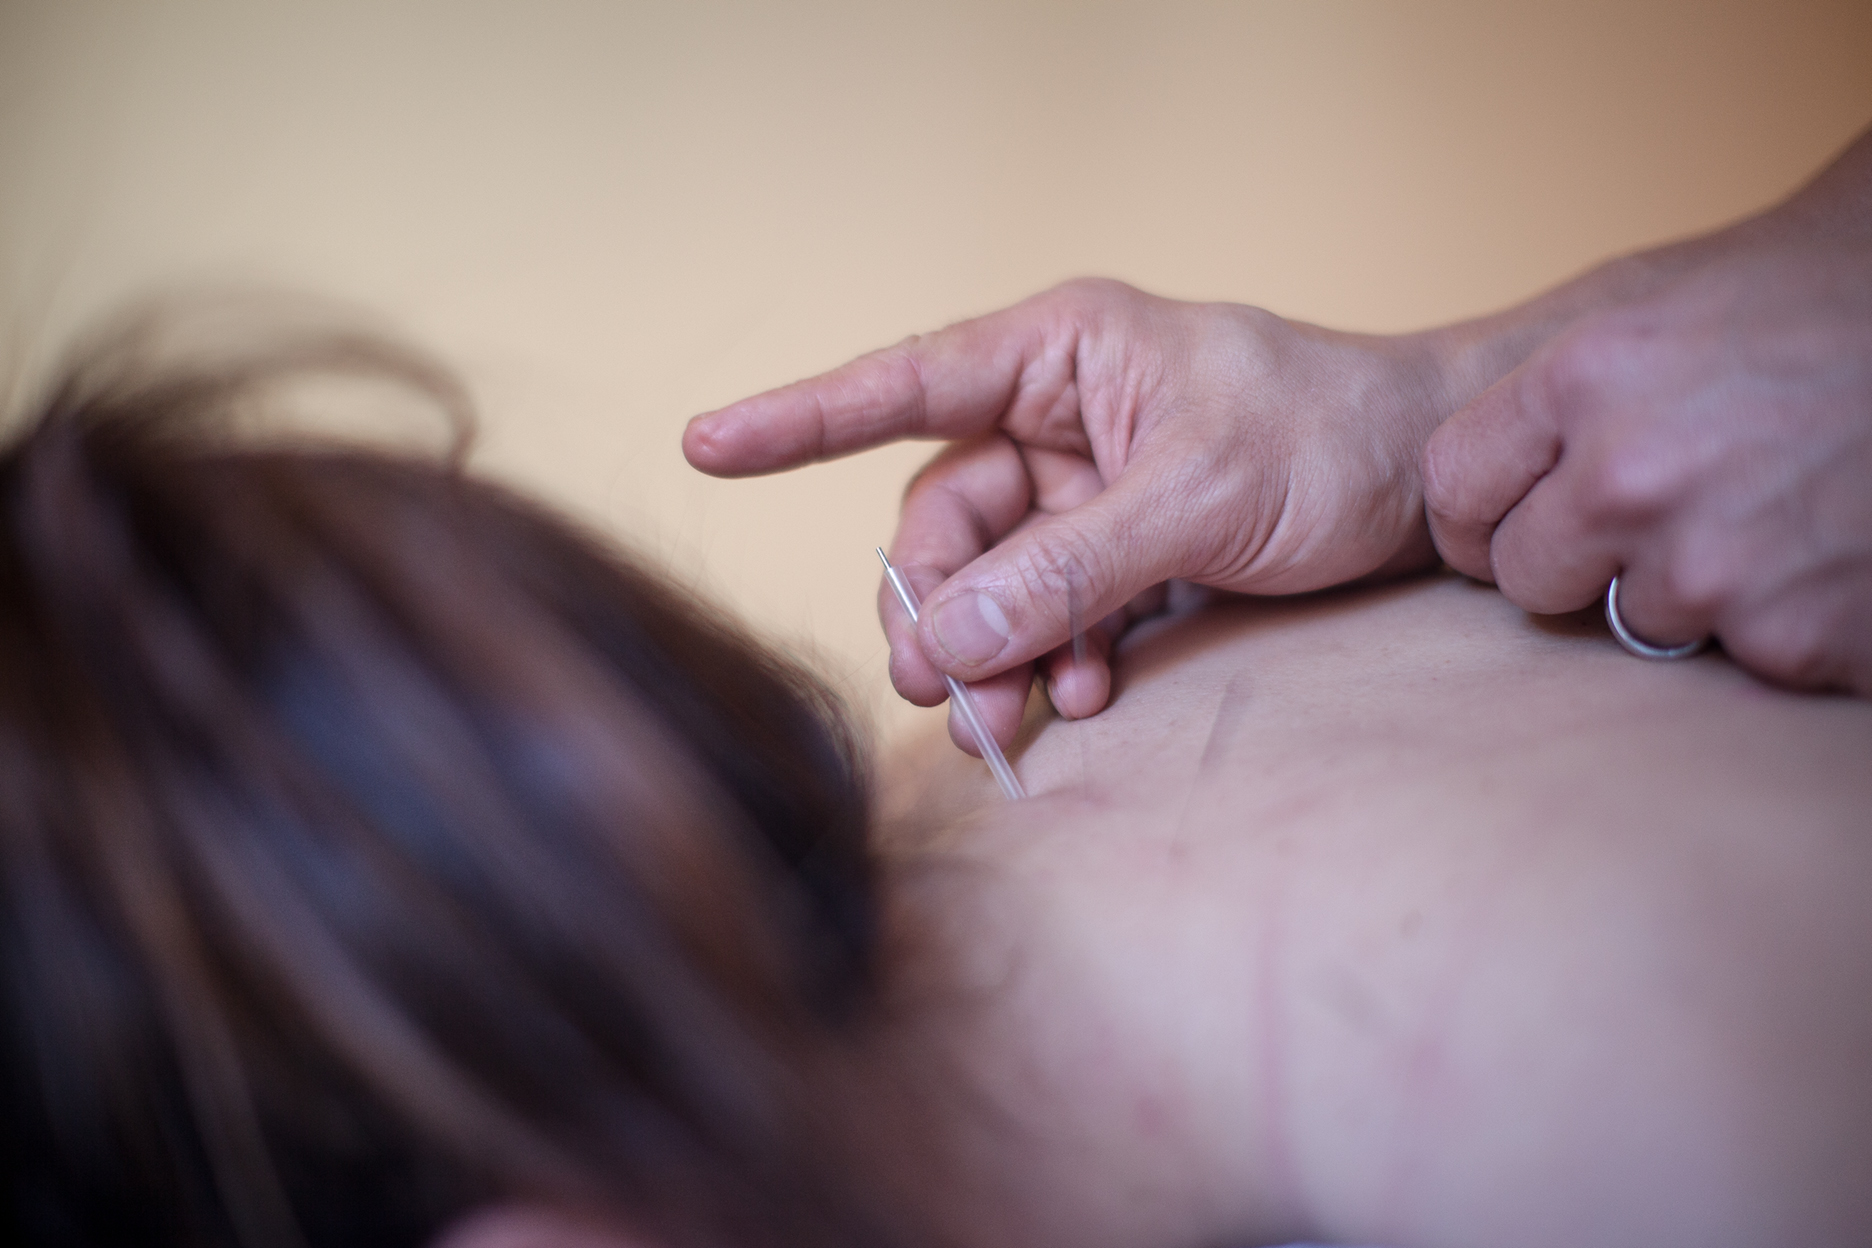 Dr. Cristina Allen, Acupuncture Provider